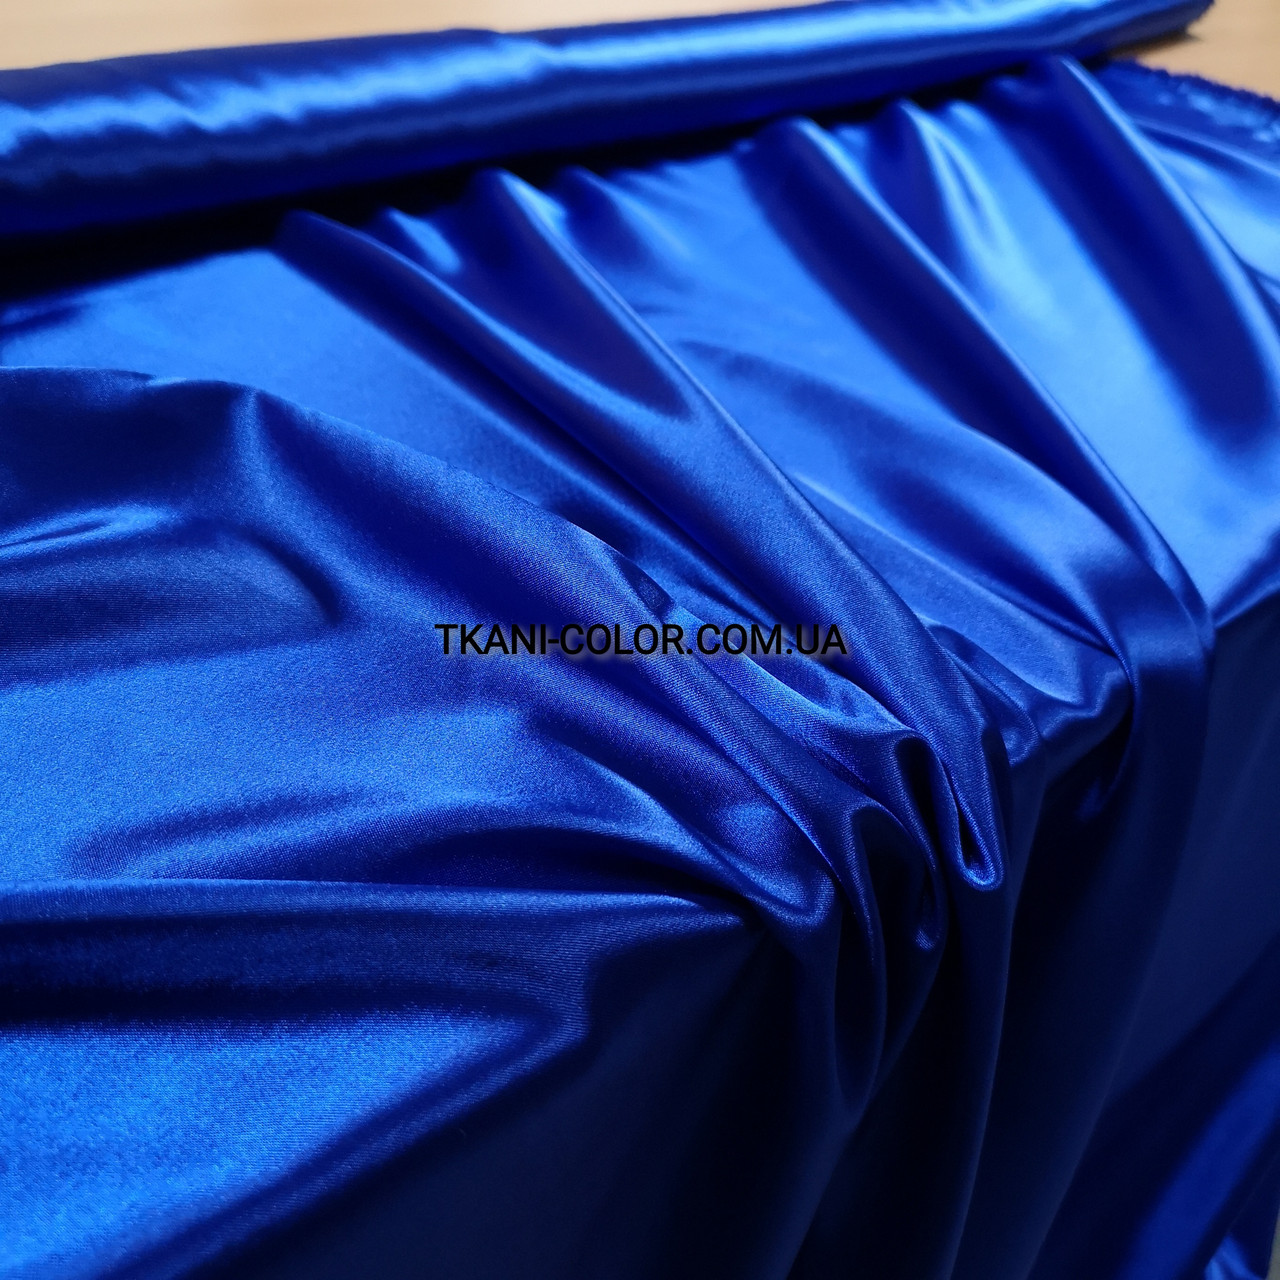 Ткань атлас стрейчевый тонкий синий электрик